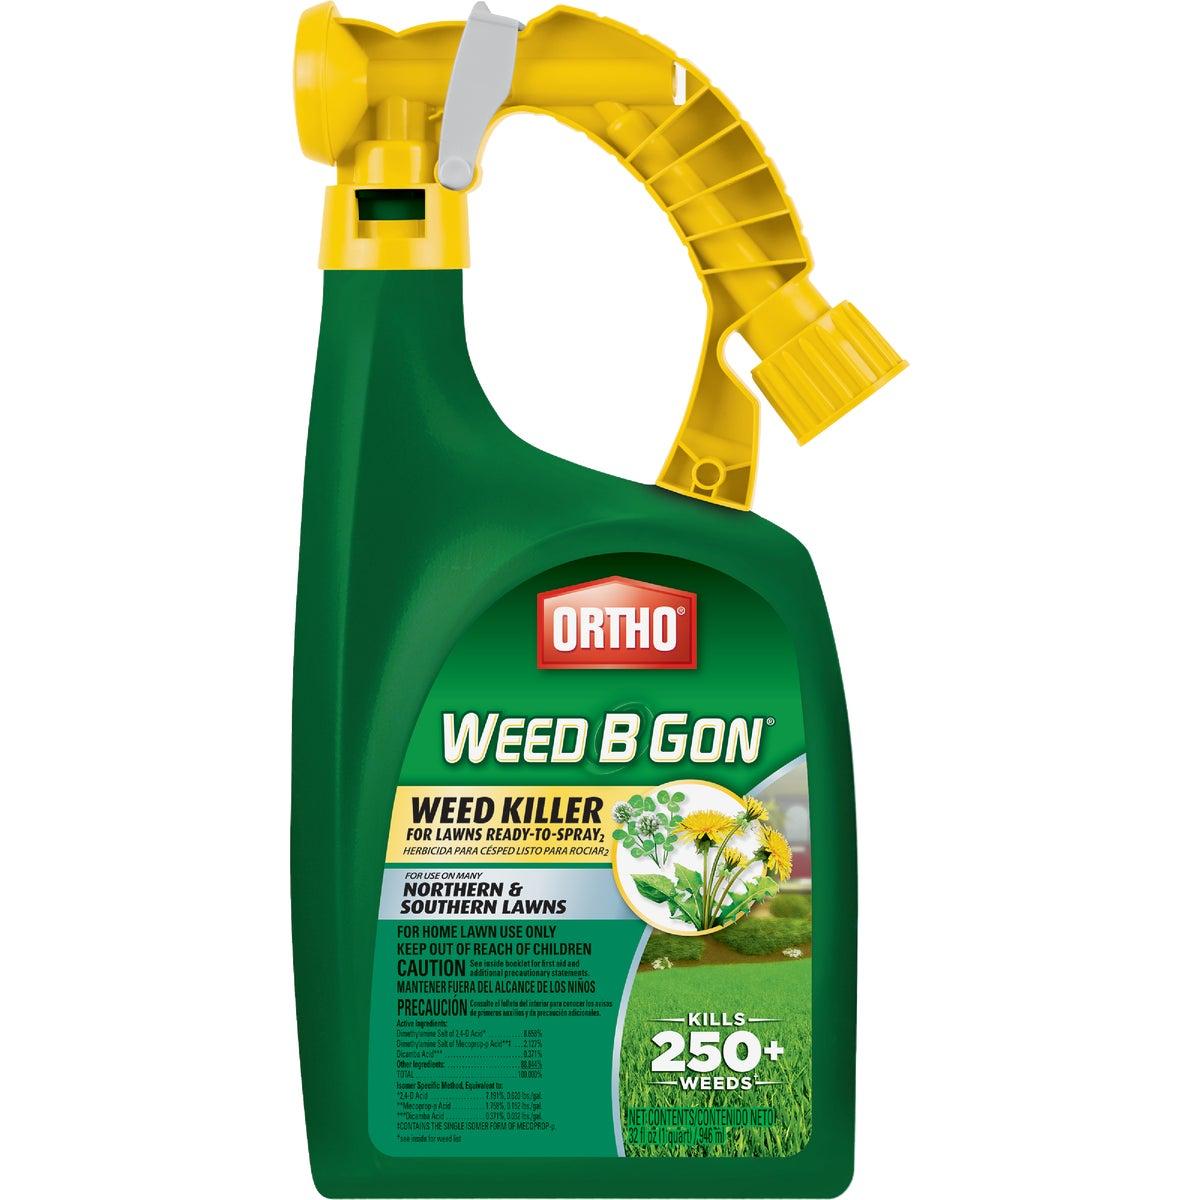 32OZ RTS WEED B GON